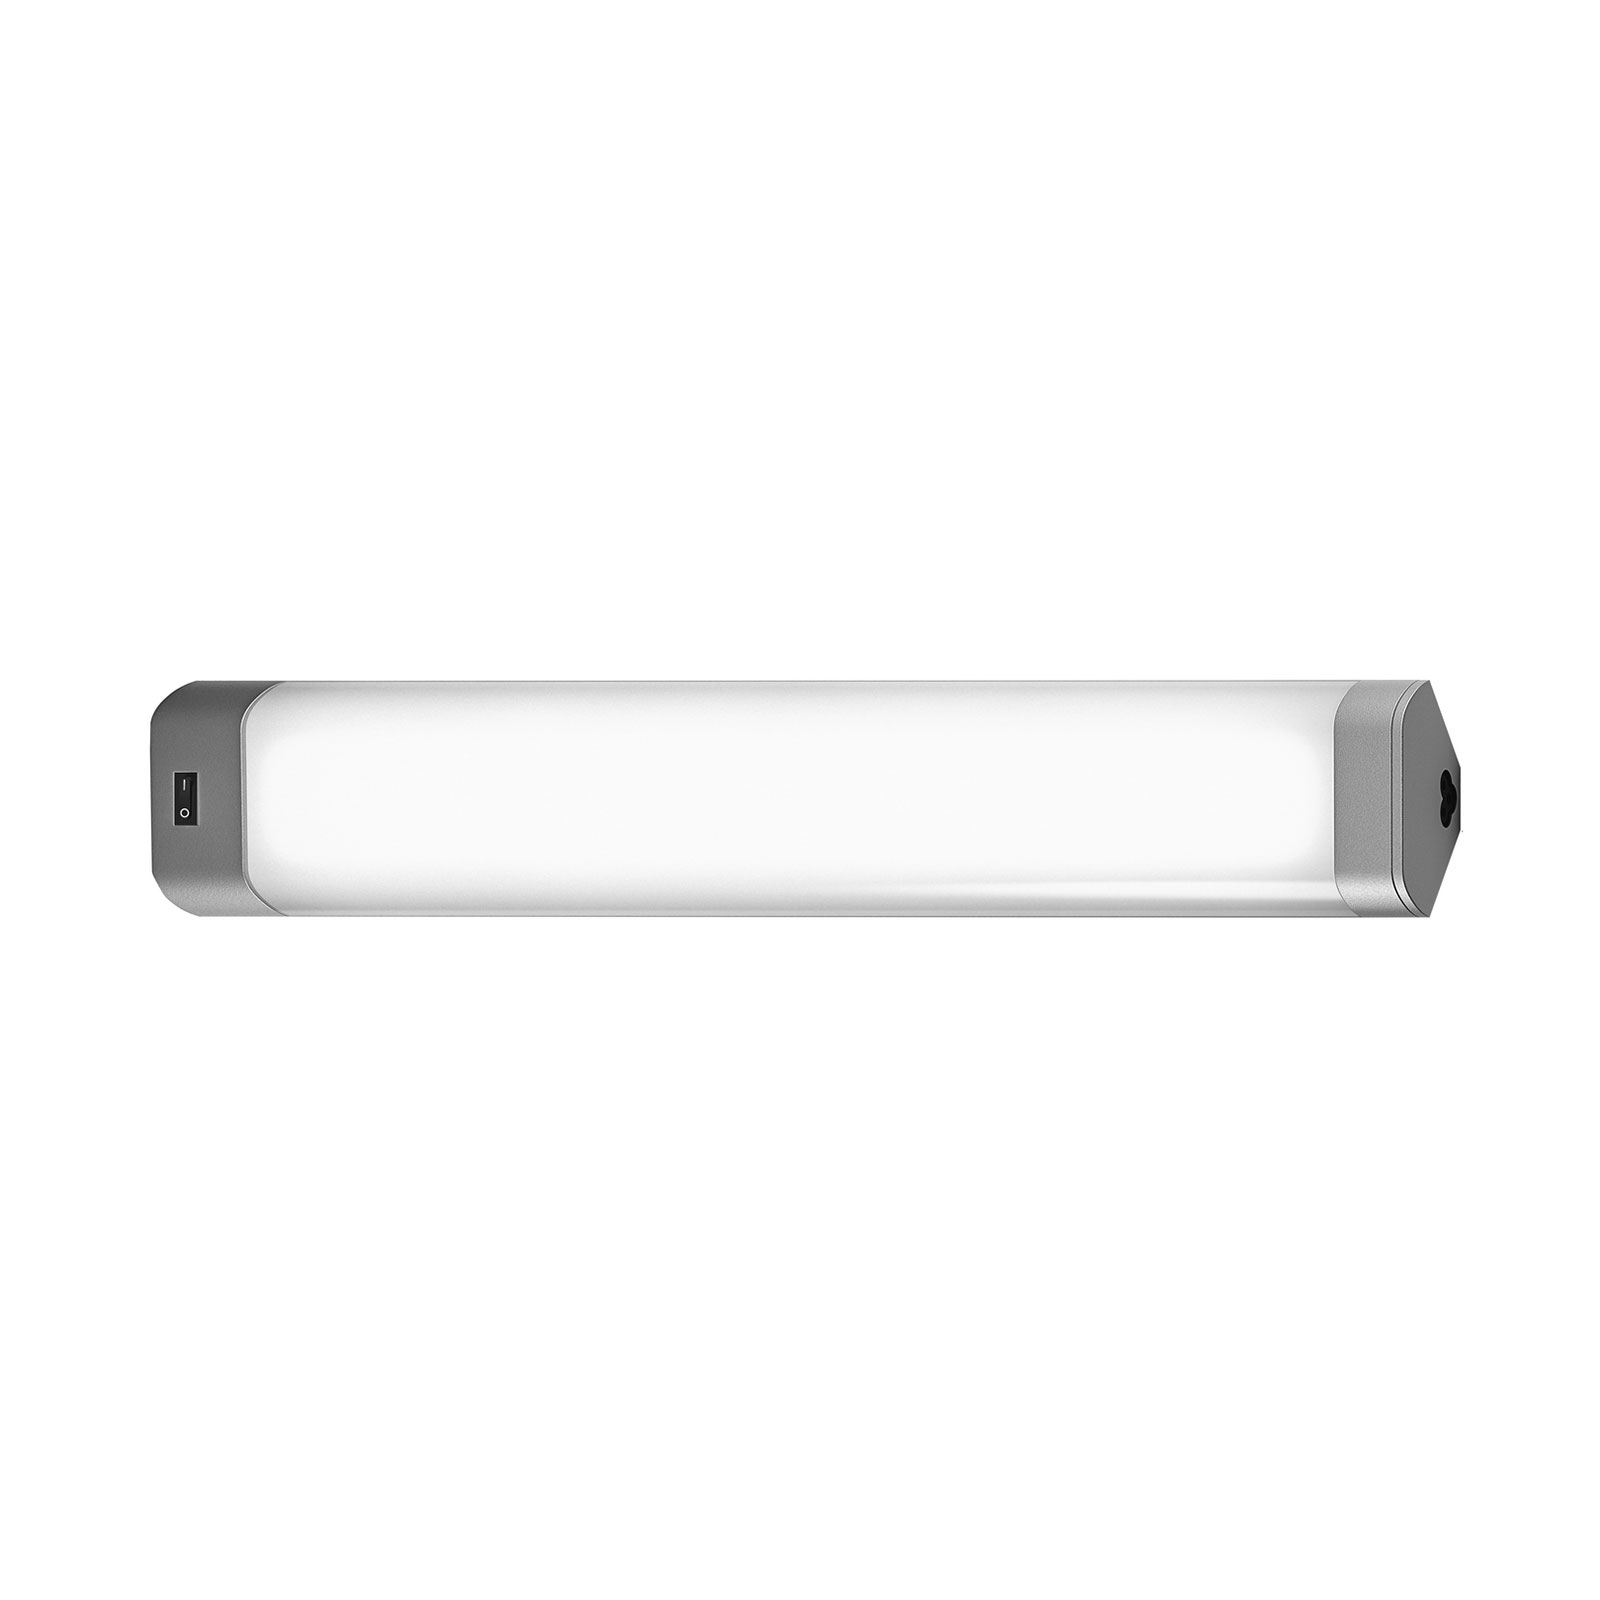 LEDVANCE Linear LED Corner lampada da mobili 0,5 m